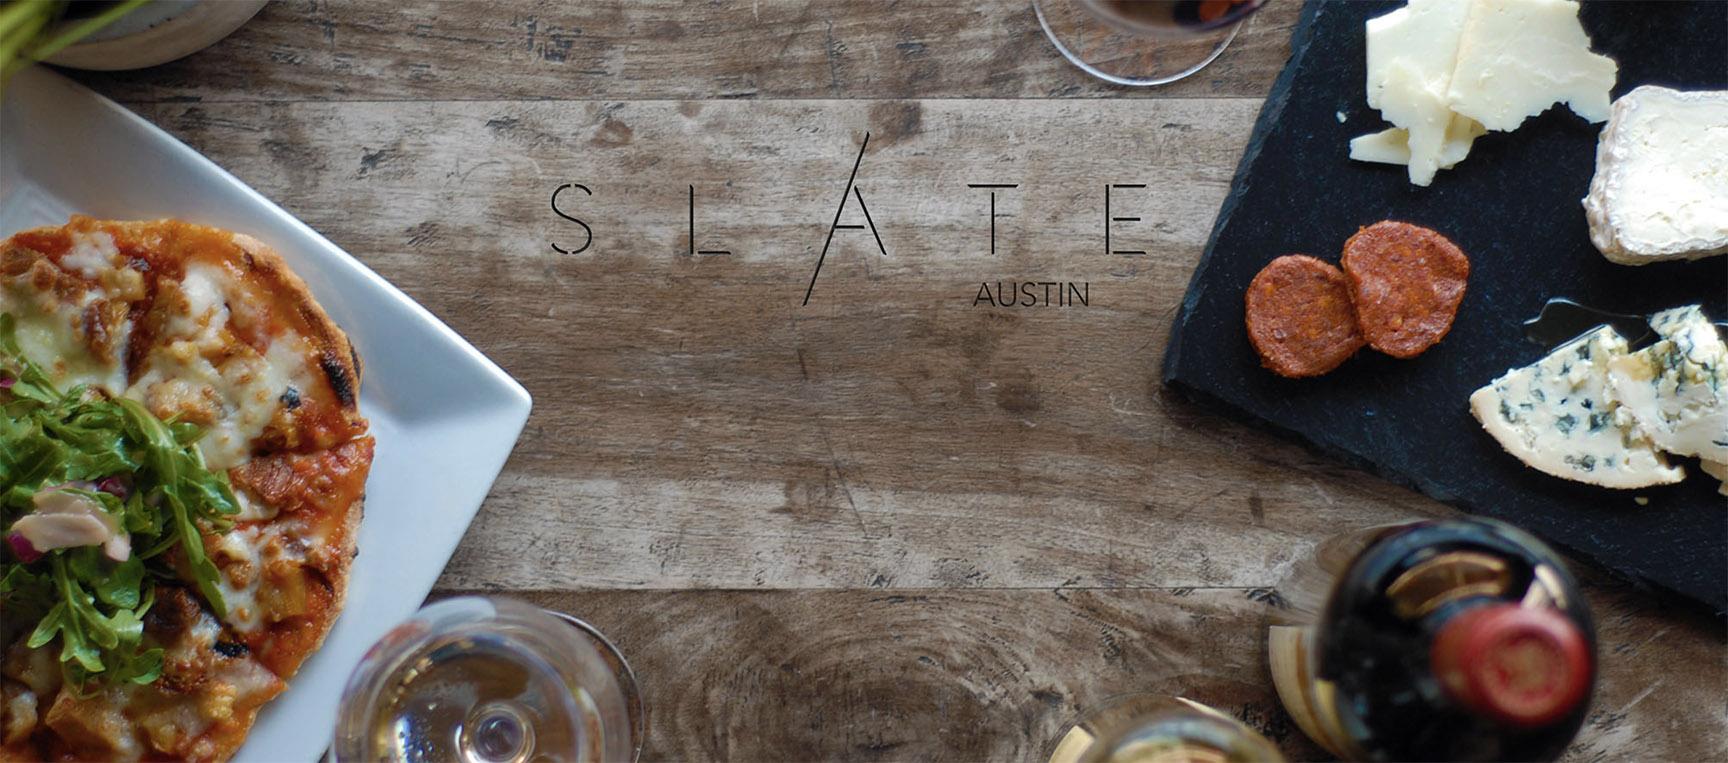 Slate Austin -